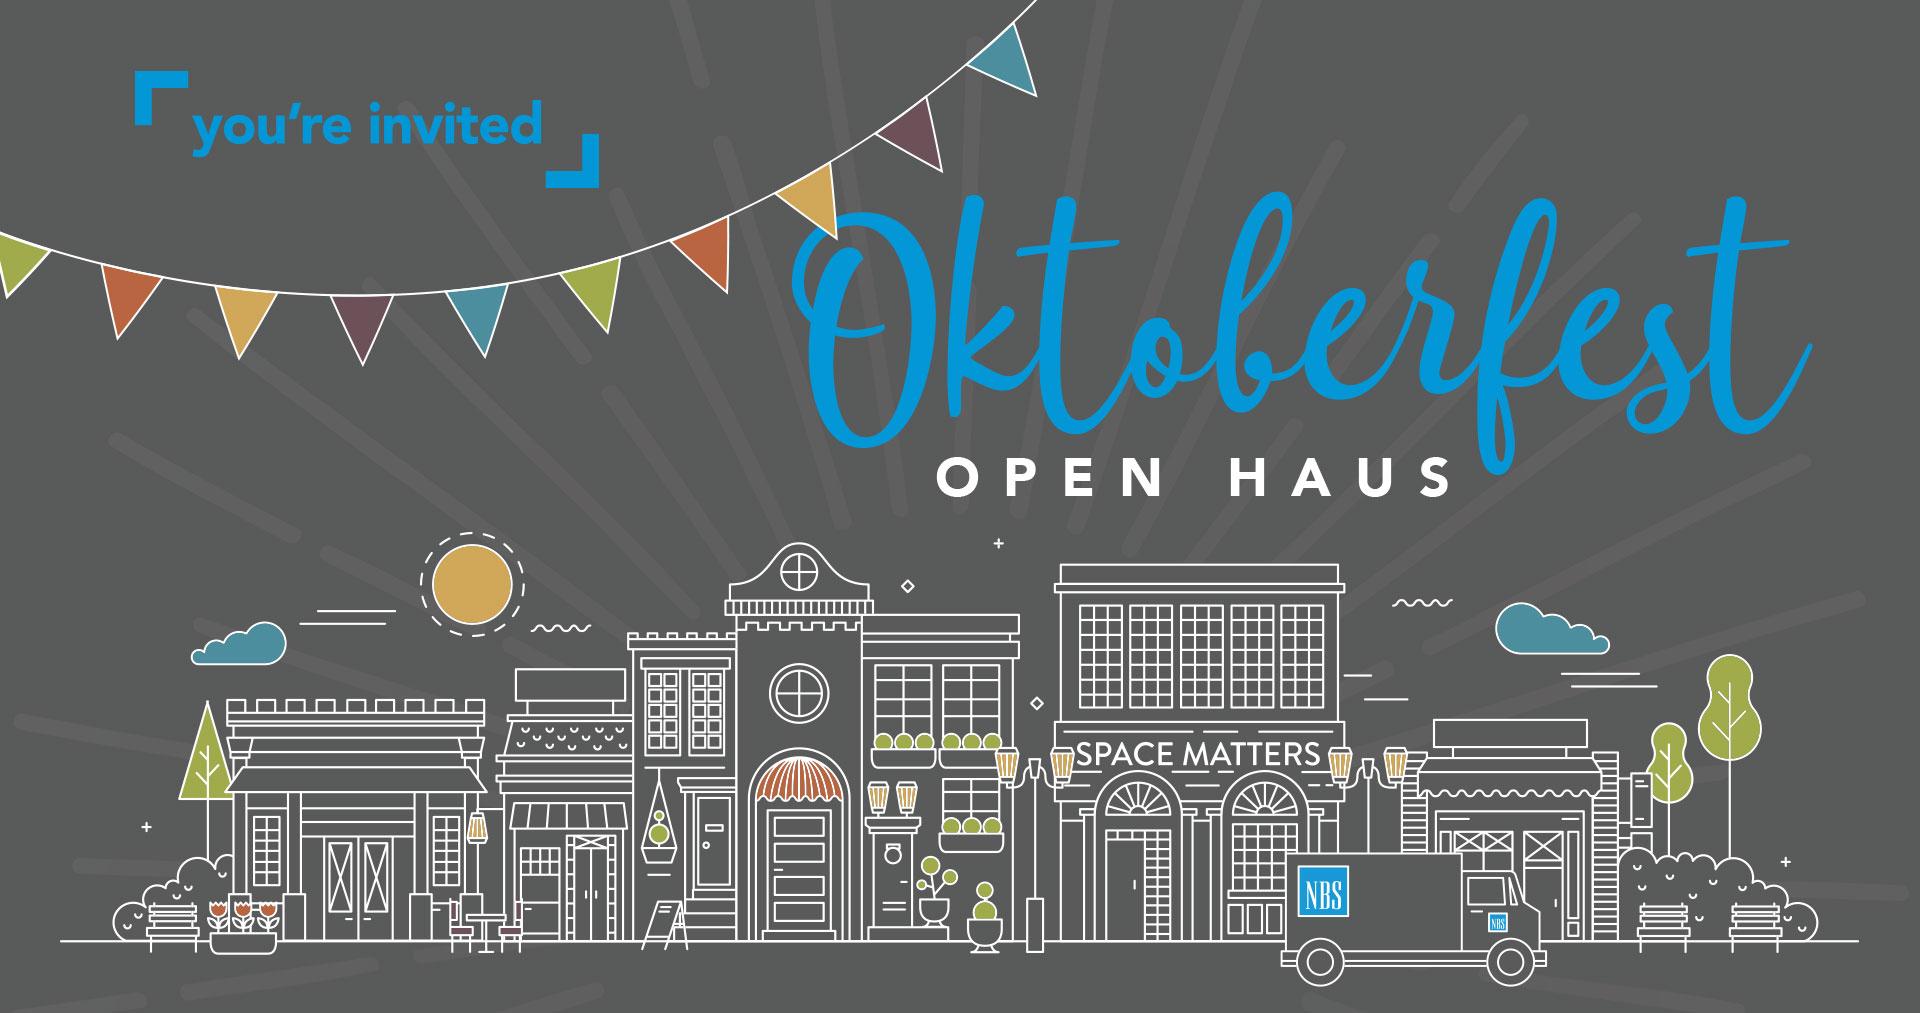 NBS_Oktoberfest.DL